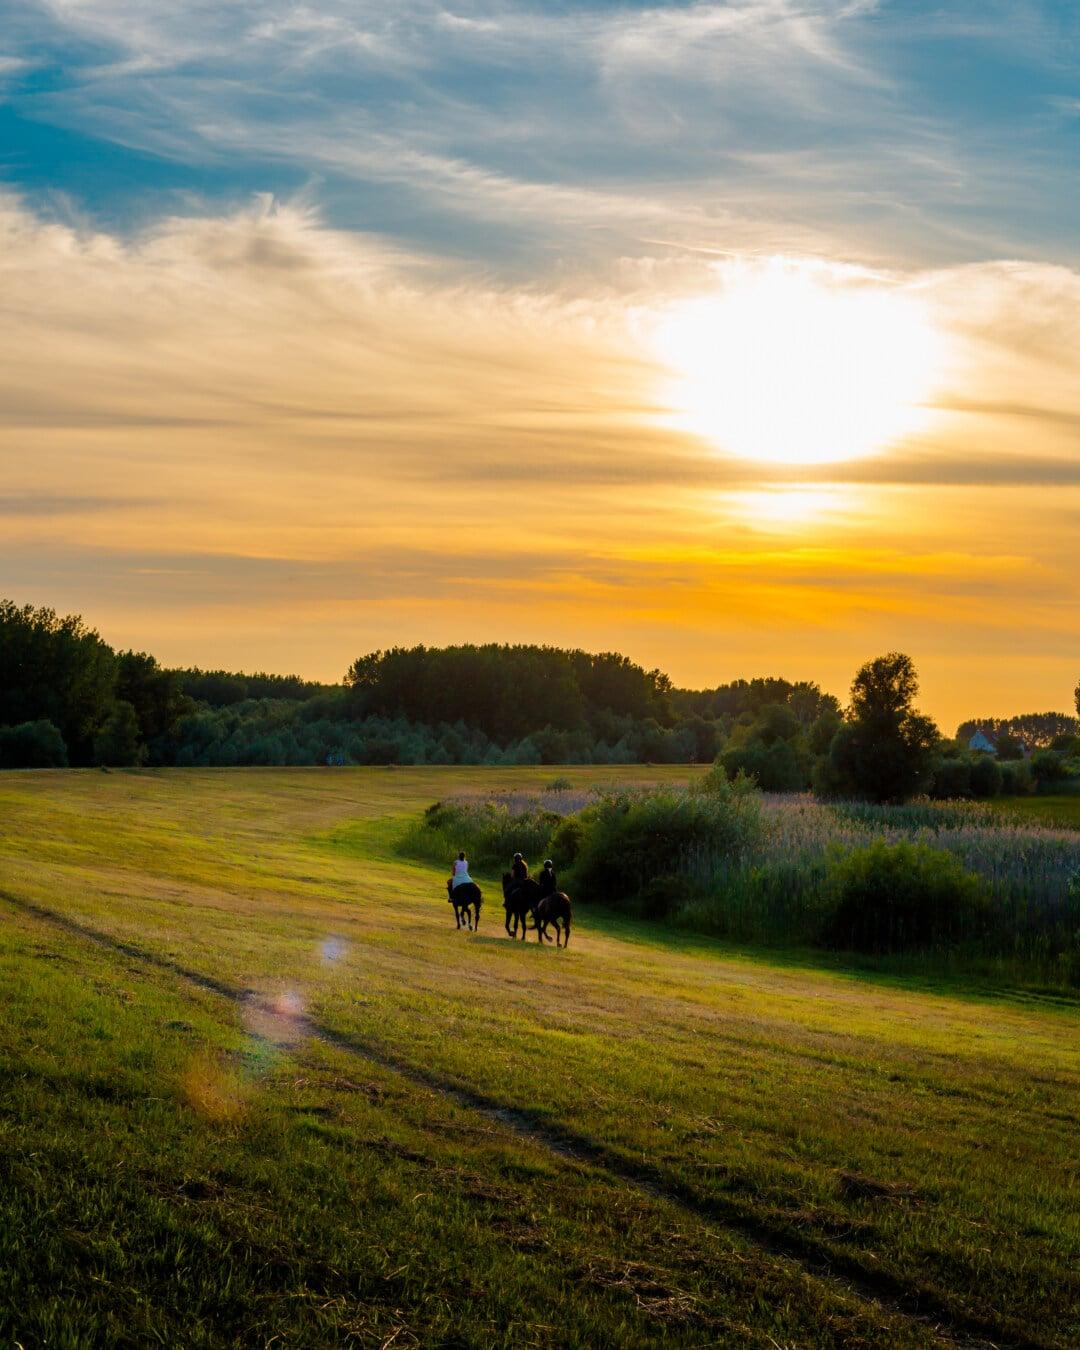 rider, horses, training program, atmosphere, majestic, sunset, dawn, rural, landscape, farmland